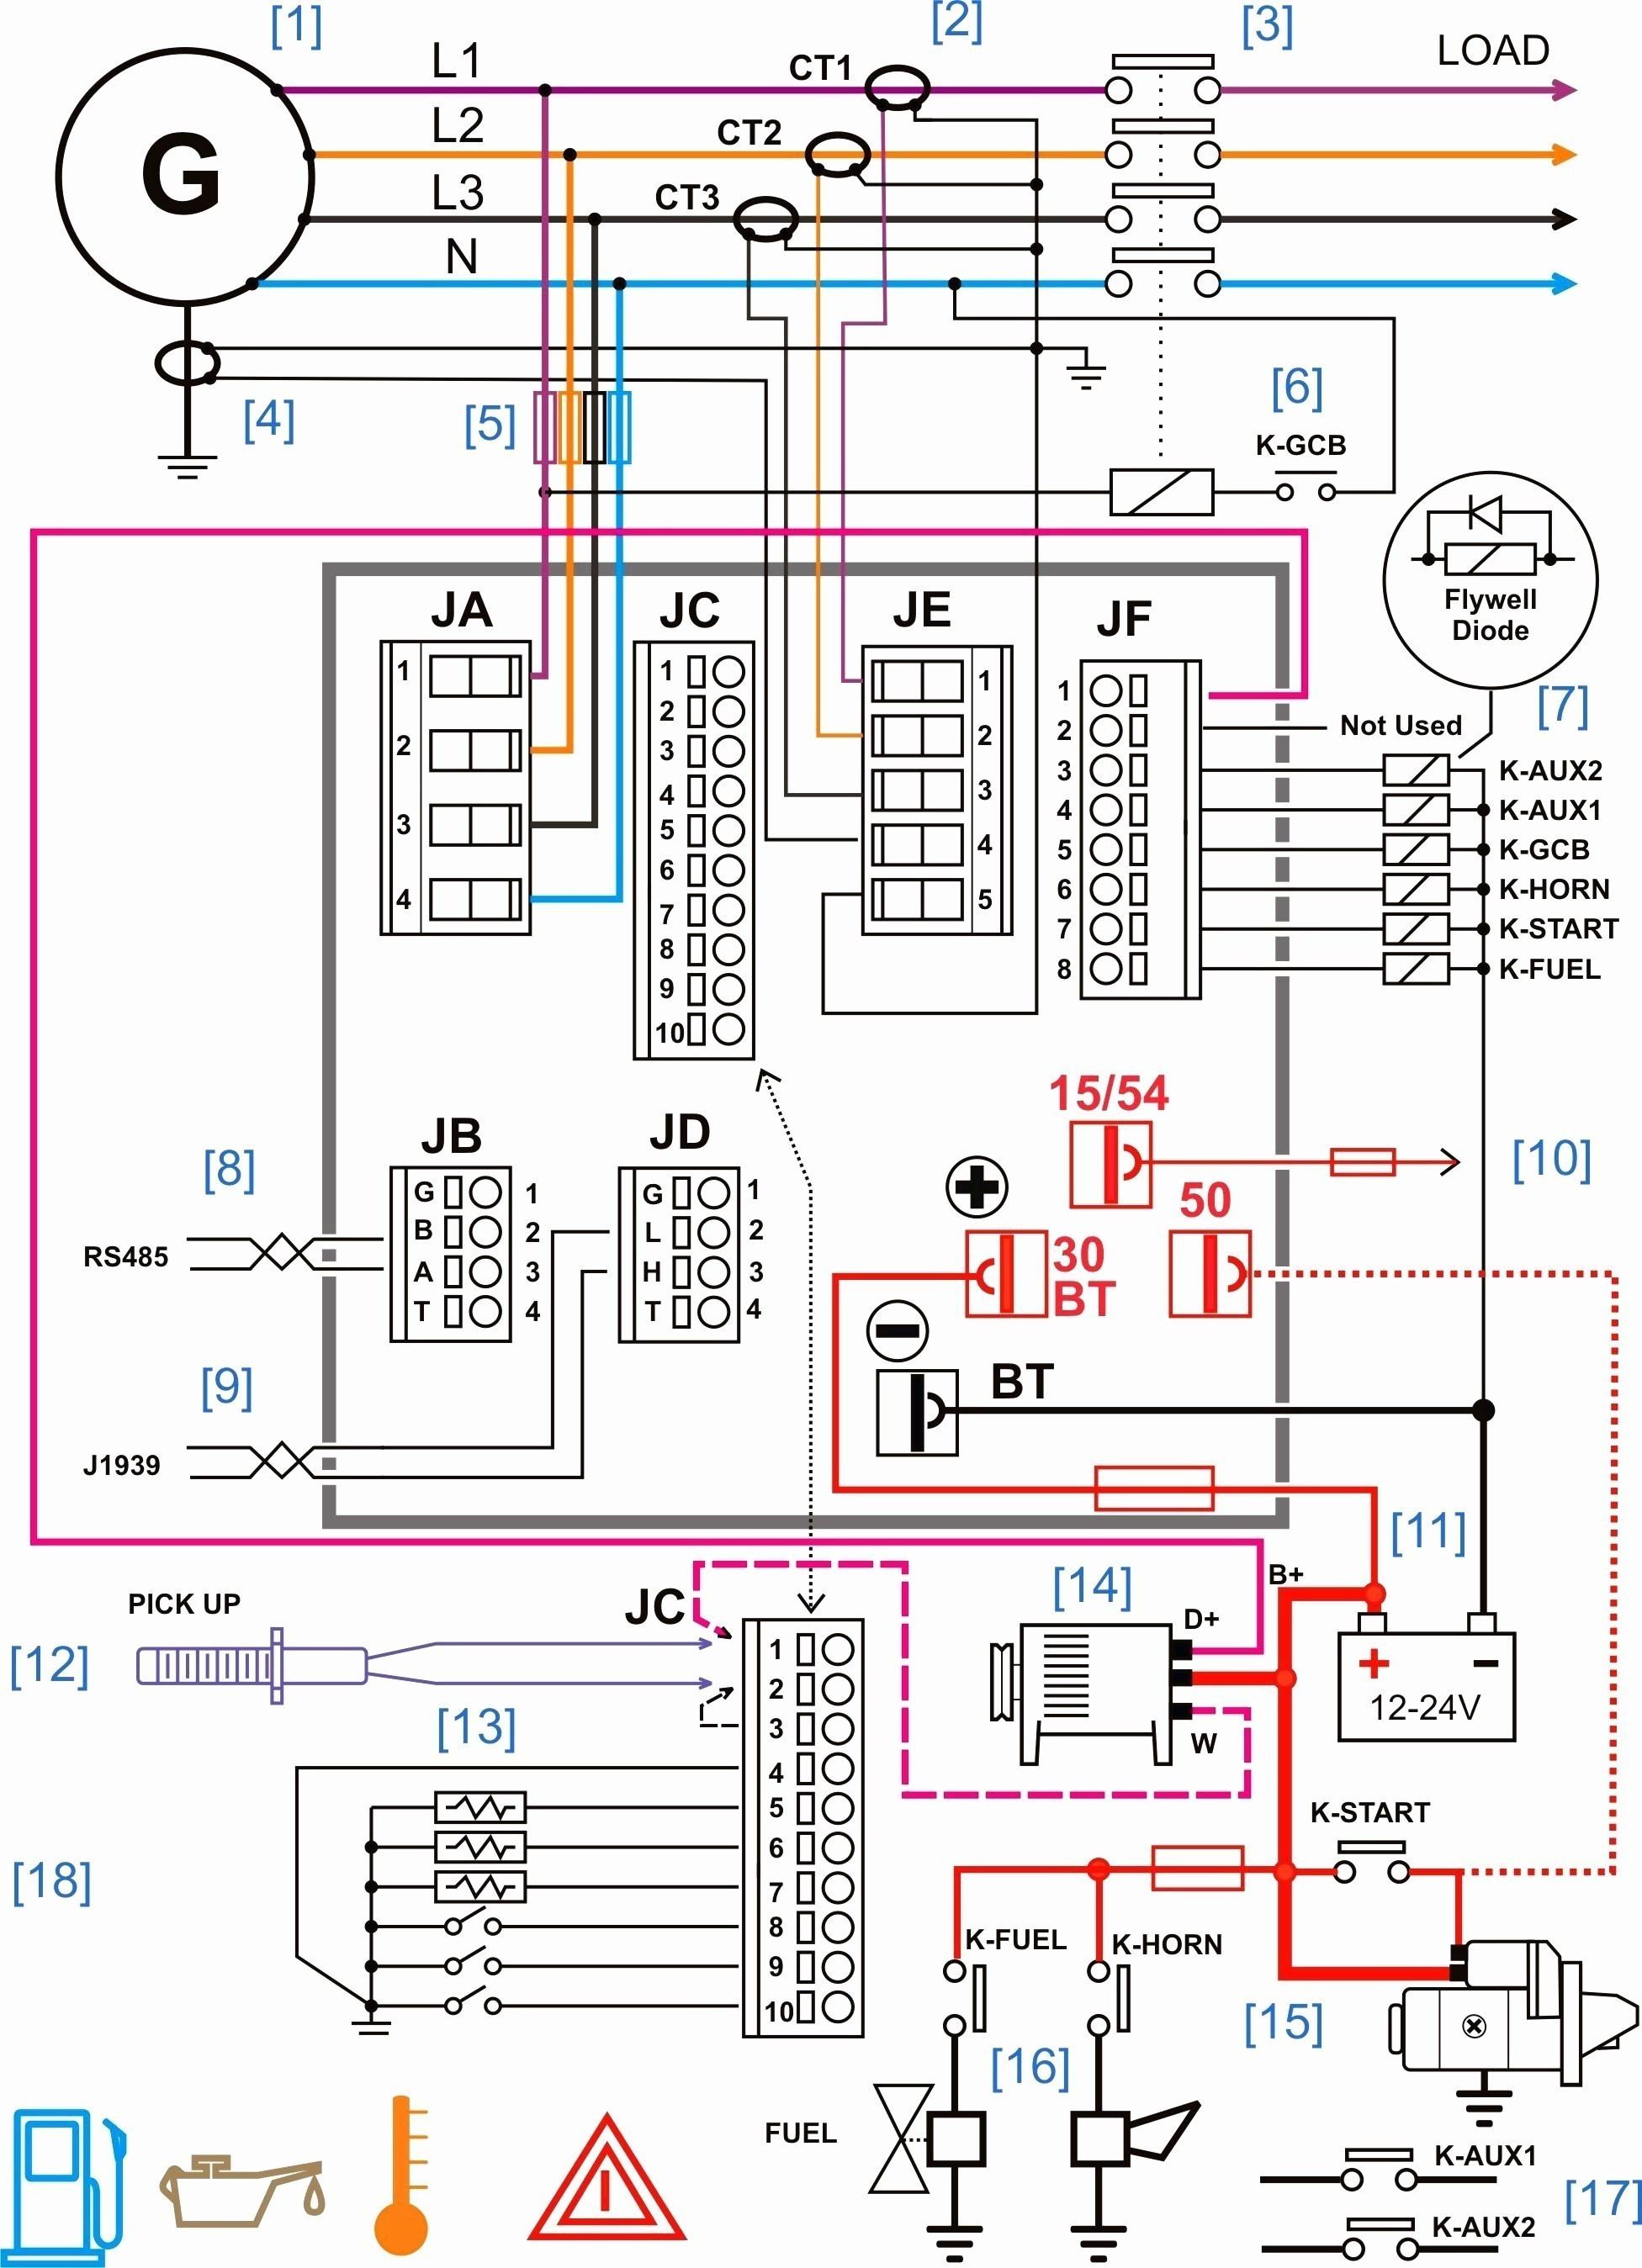 Car Audio Installation Diagram Save Audi A4 Cd Player Wiring Diagram Of Car Audio Installation Diagram